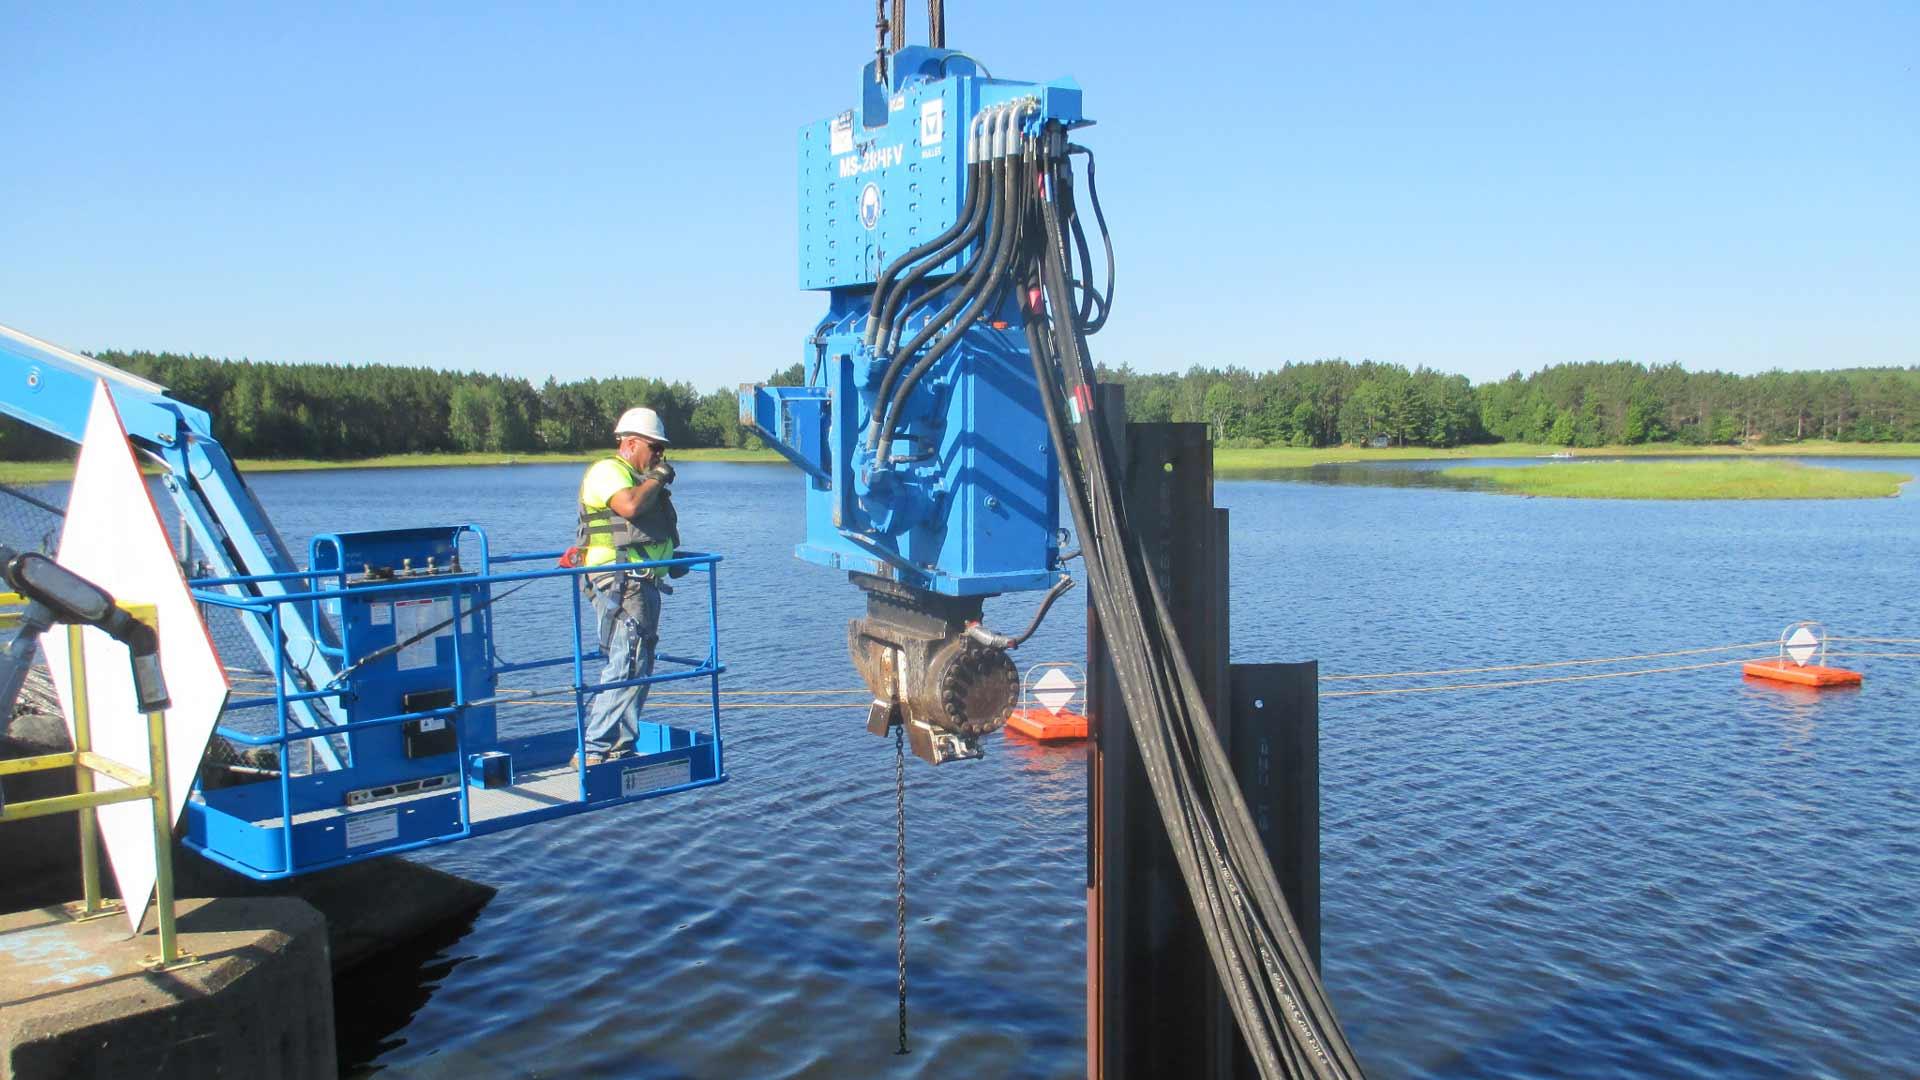 Staab employee working near water